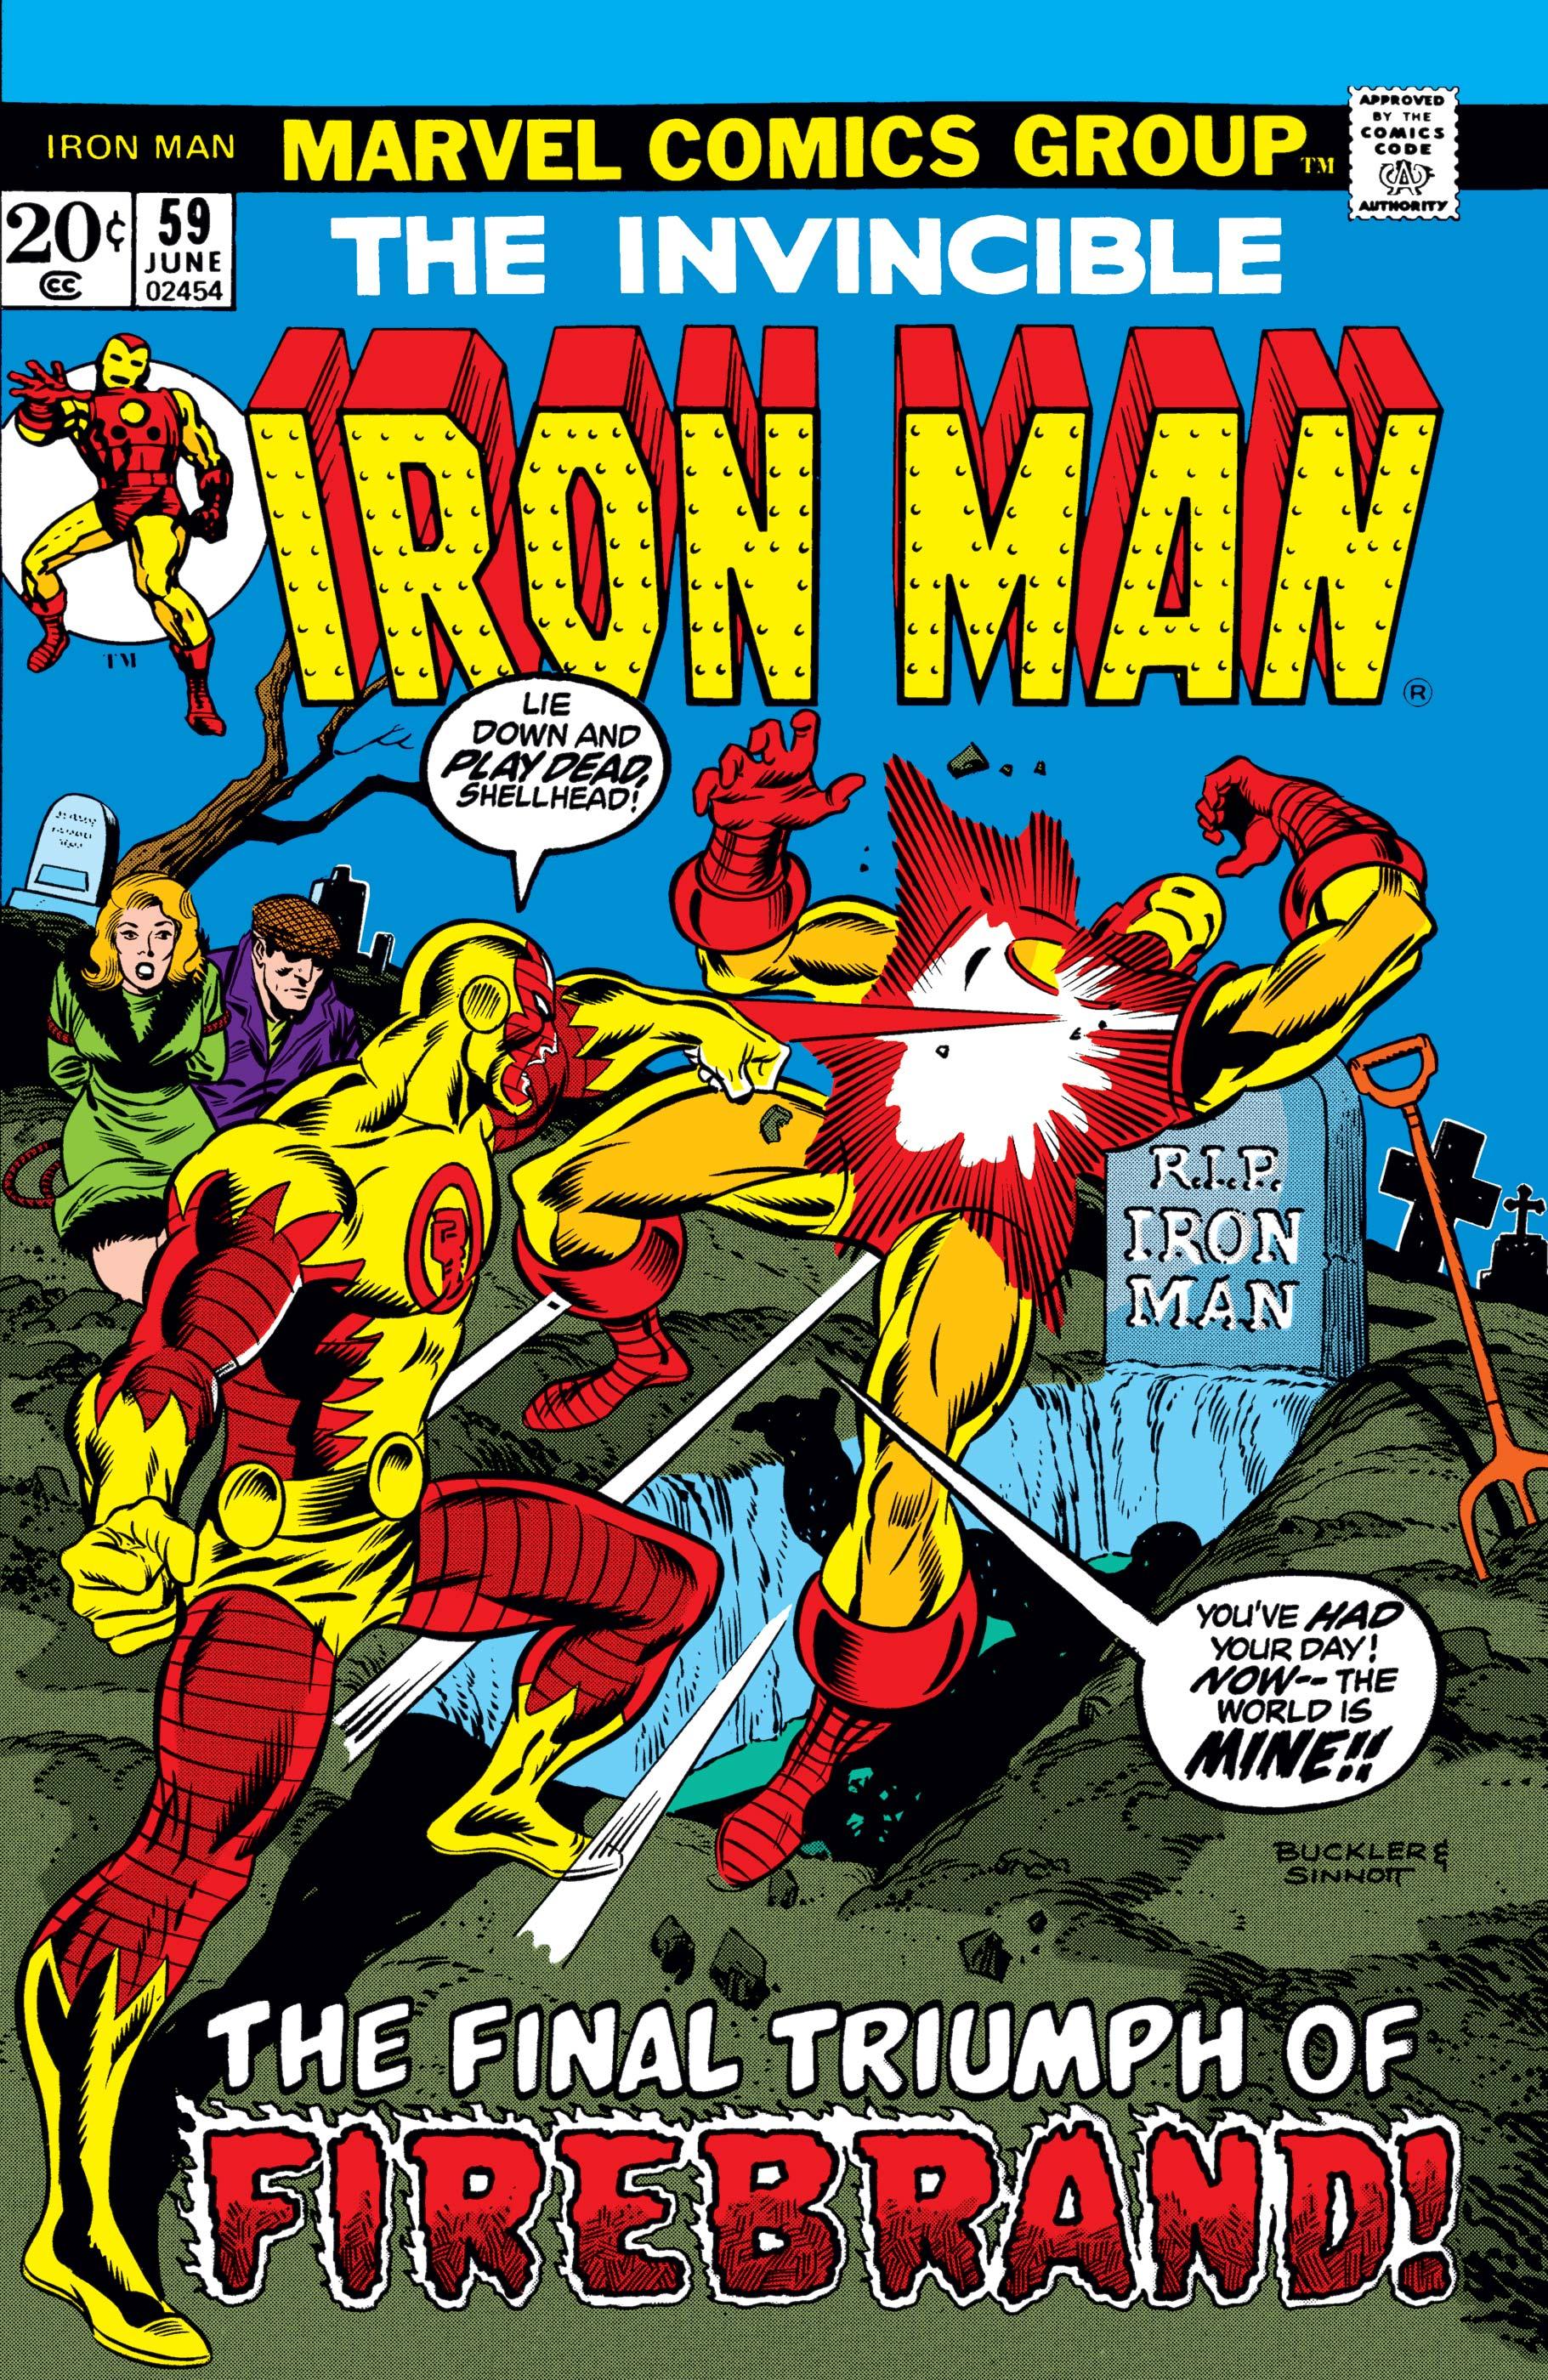 Iron Man (1968) #59